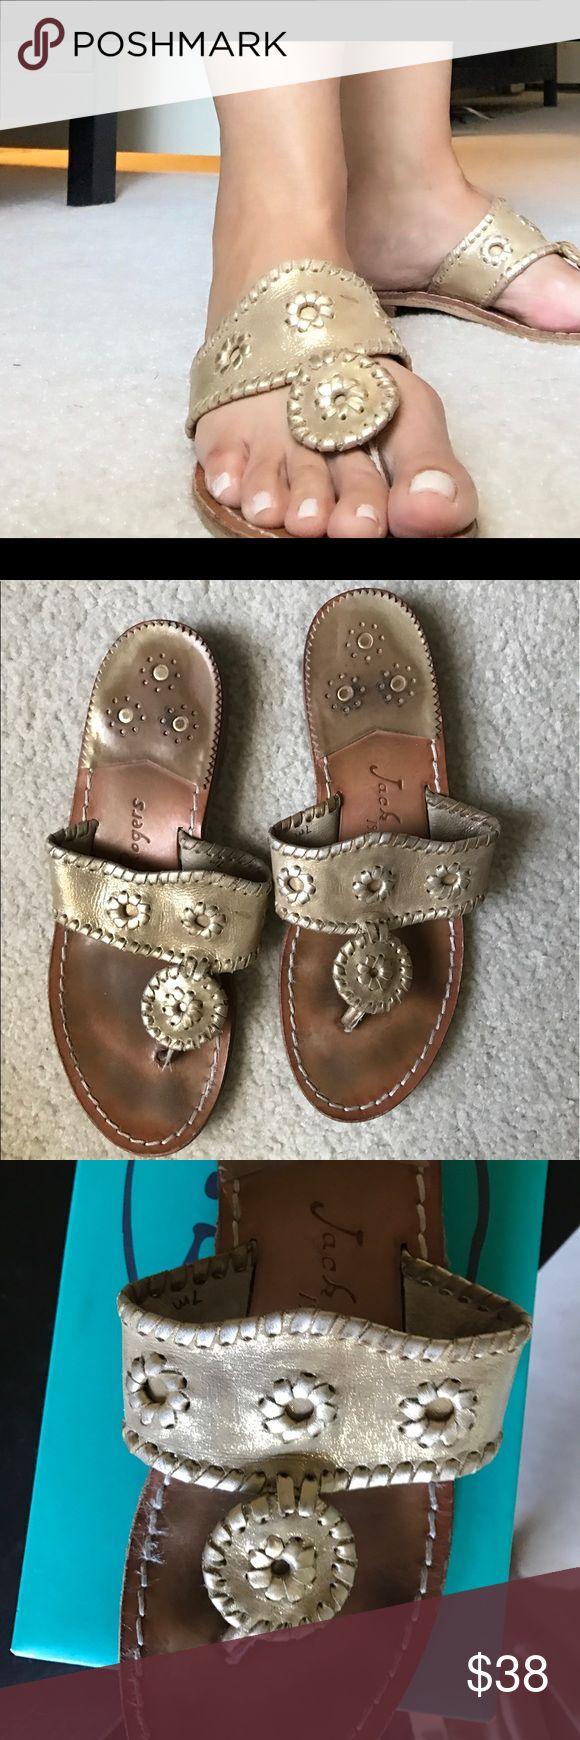 Jack Rodgers Stardust Sandals Loved Jack Rodgers Gold Size 7 Jack Rogers Shoes Sandals